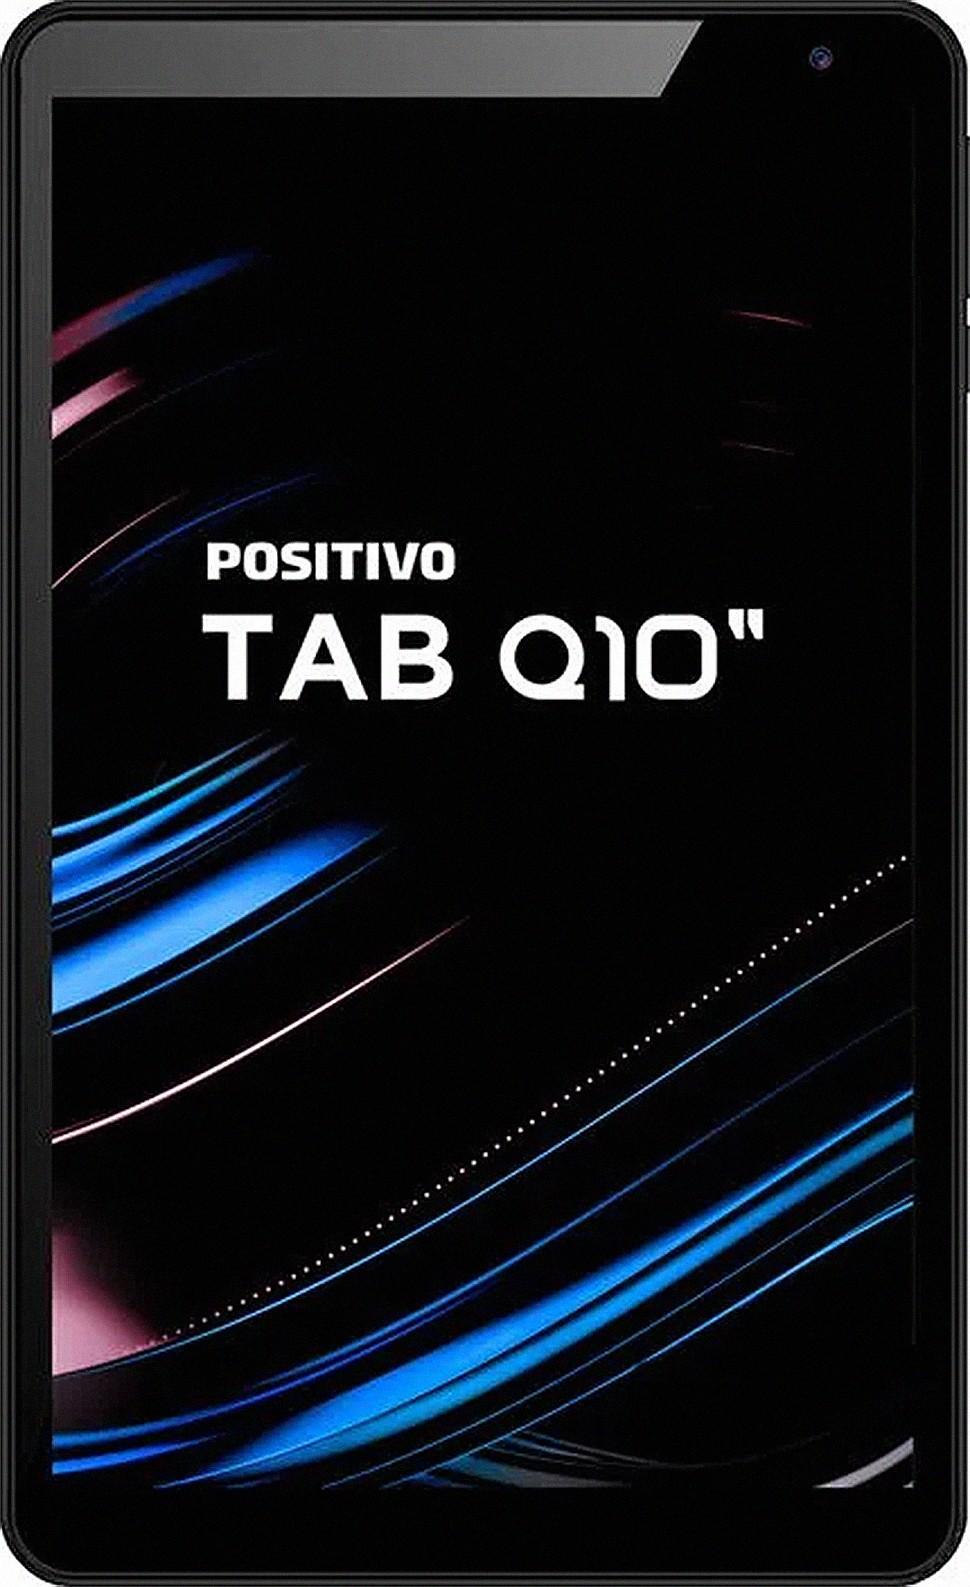 Positivo Tab Q10